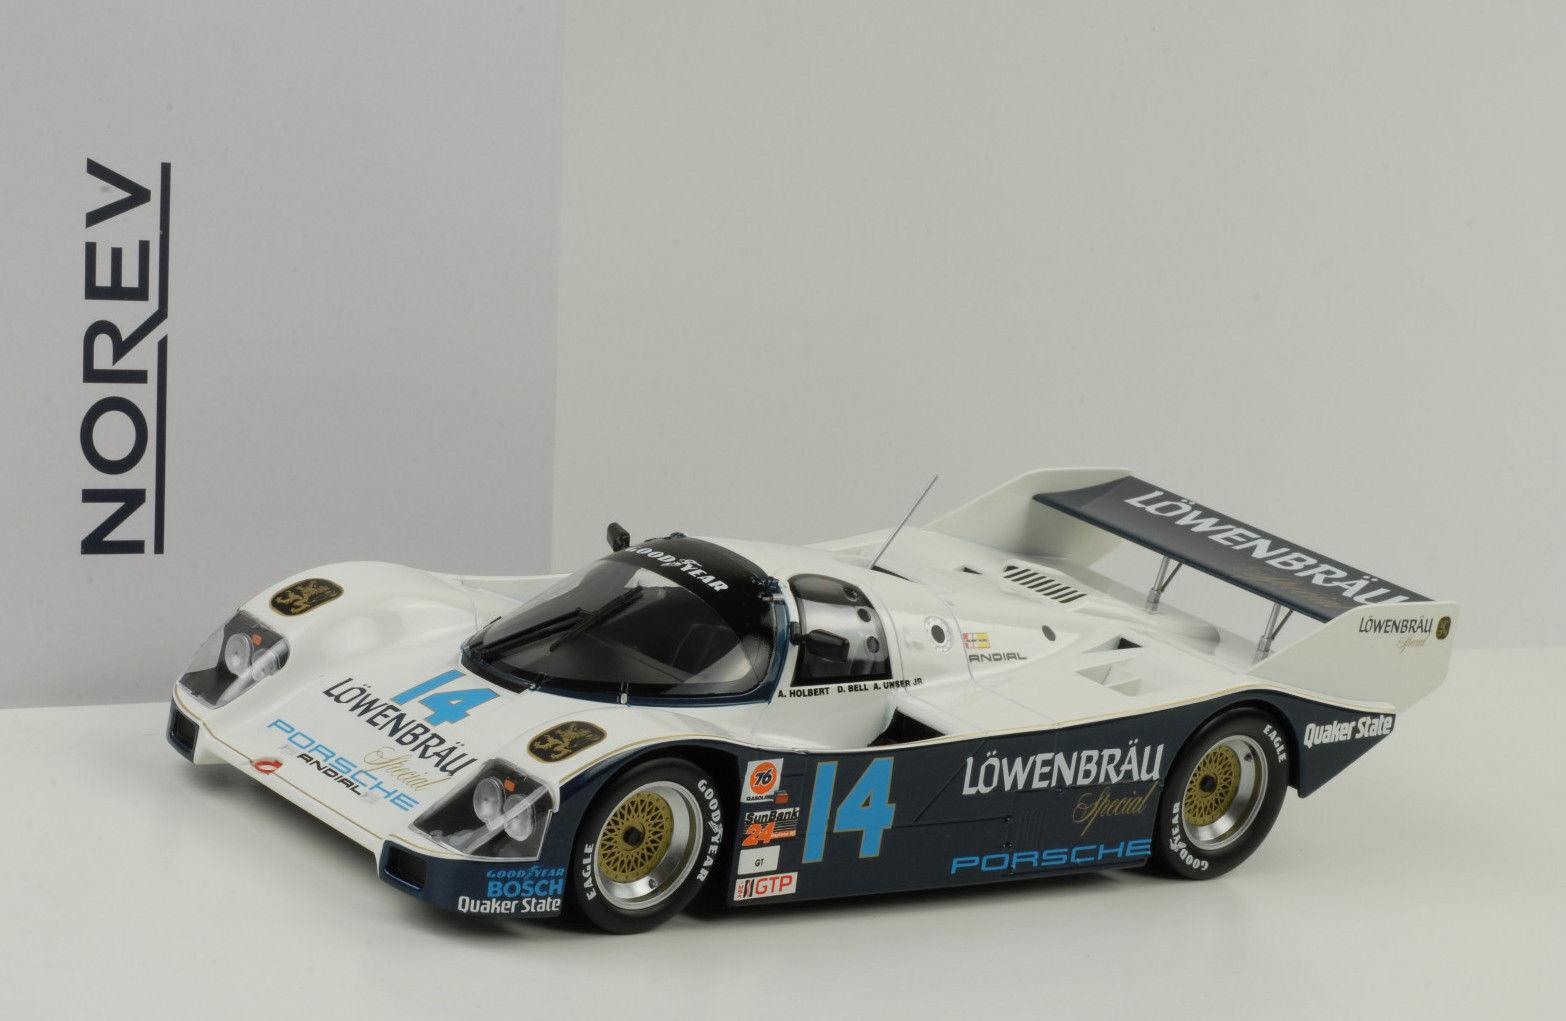 1986 Porsche 962 C 14  Lion Hurlant Gangant 24h Daytona Holbert Cloche 1 18 Norev  meilleur service